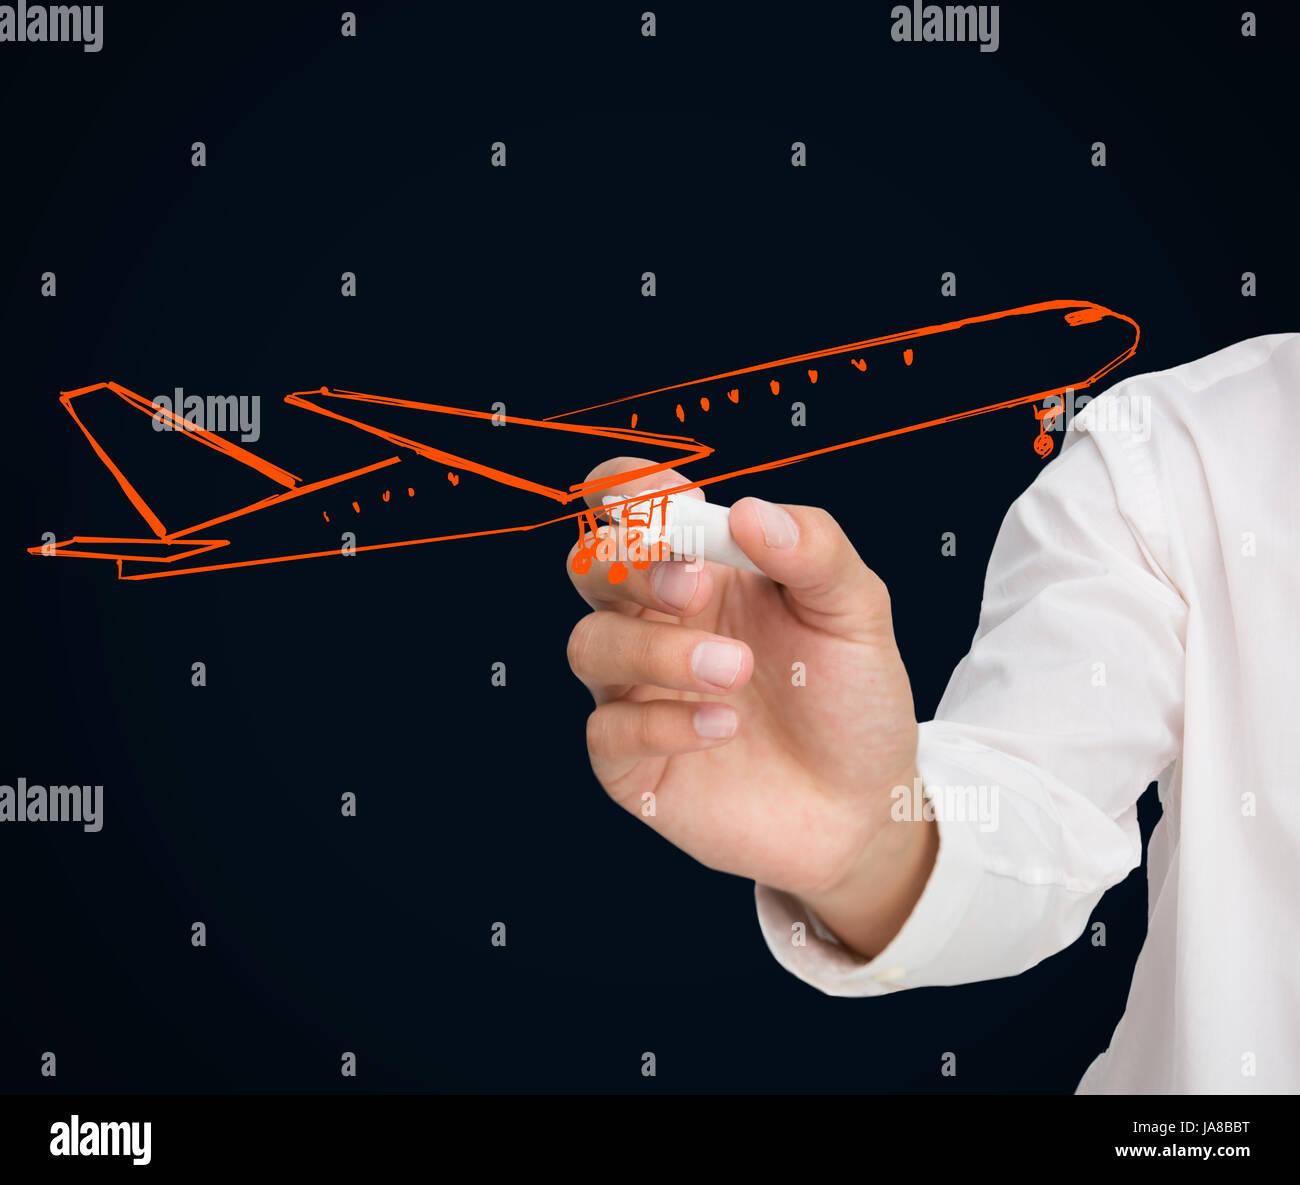 Buisnessman drawing orange airplane on black background - Stock Image